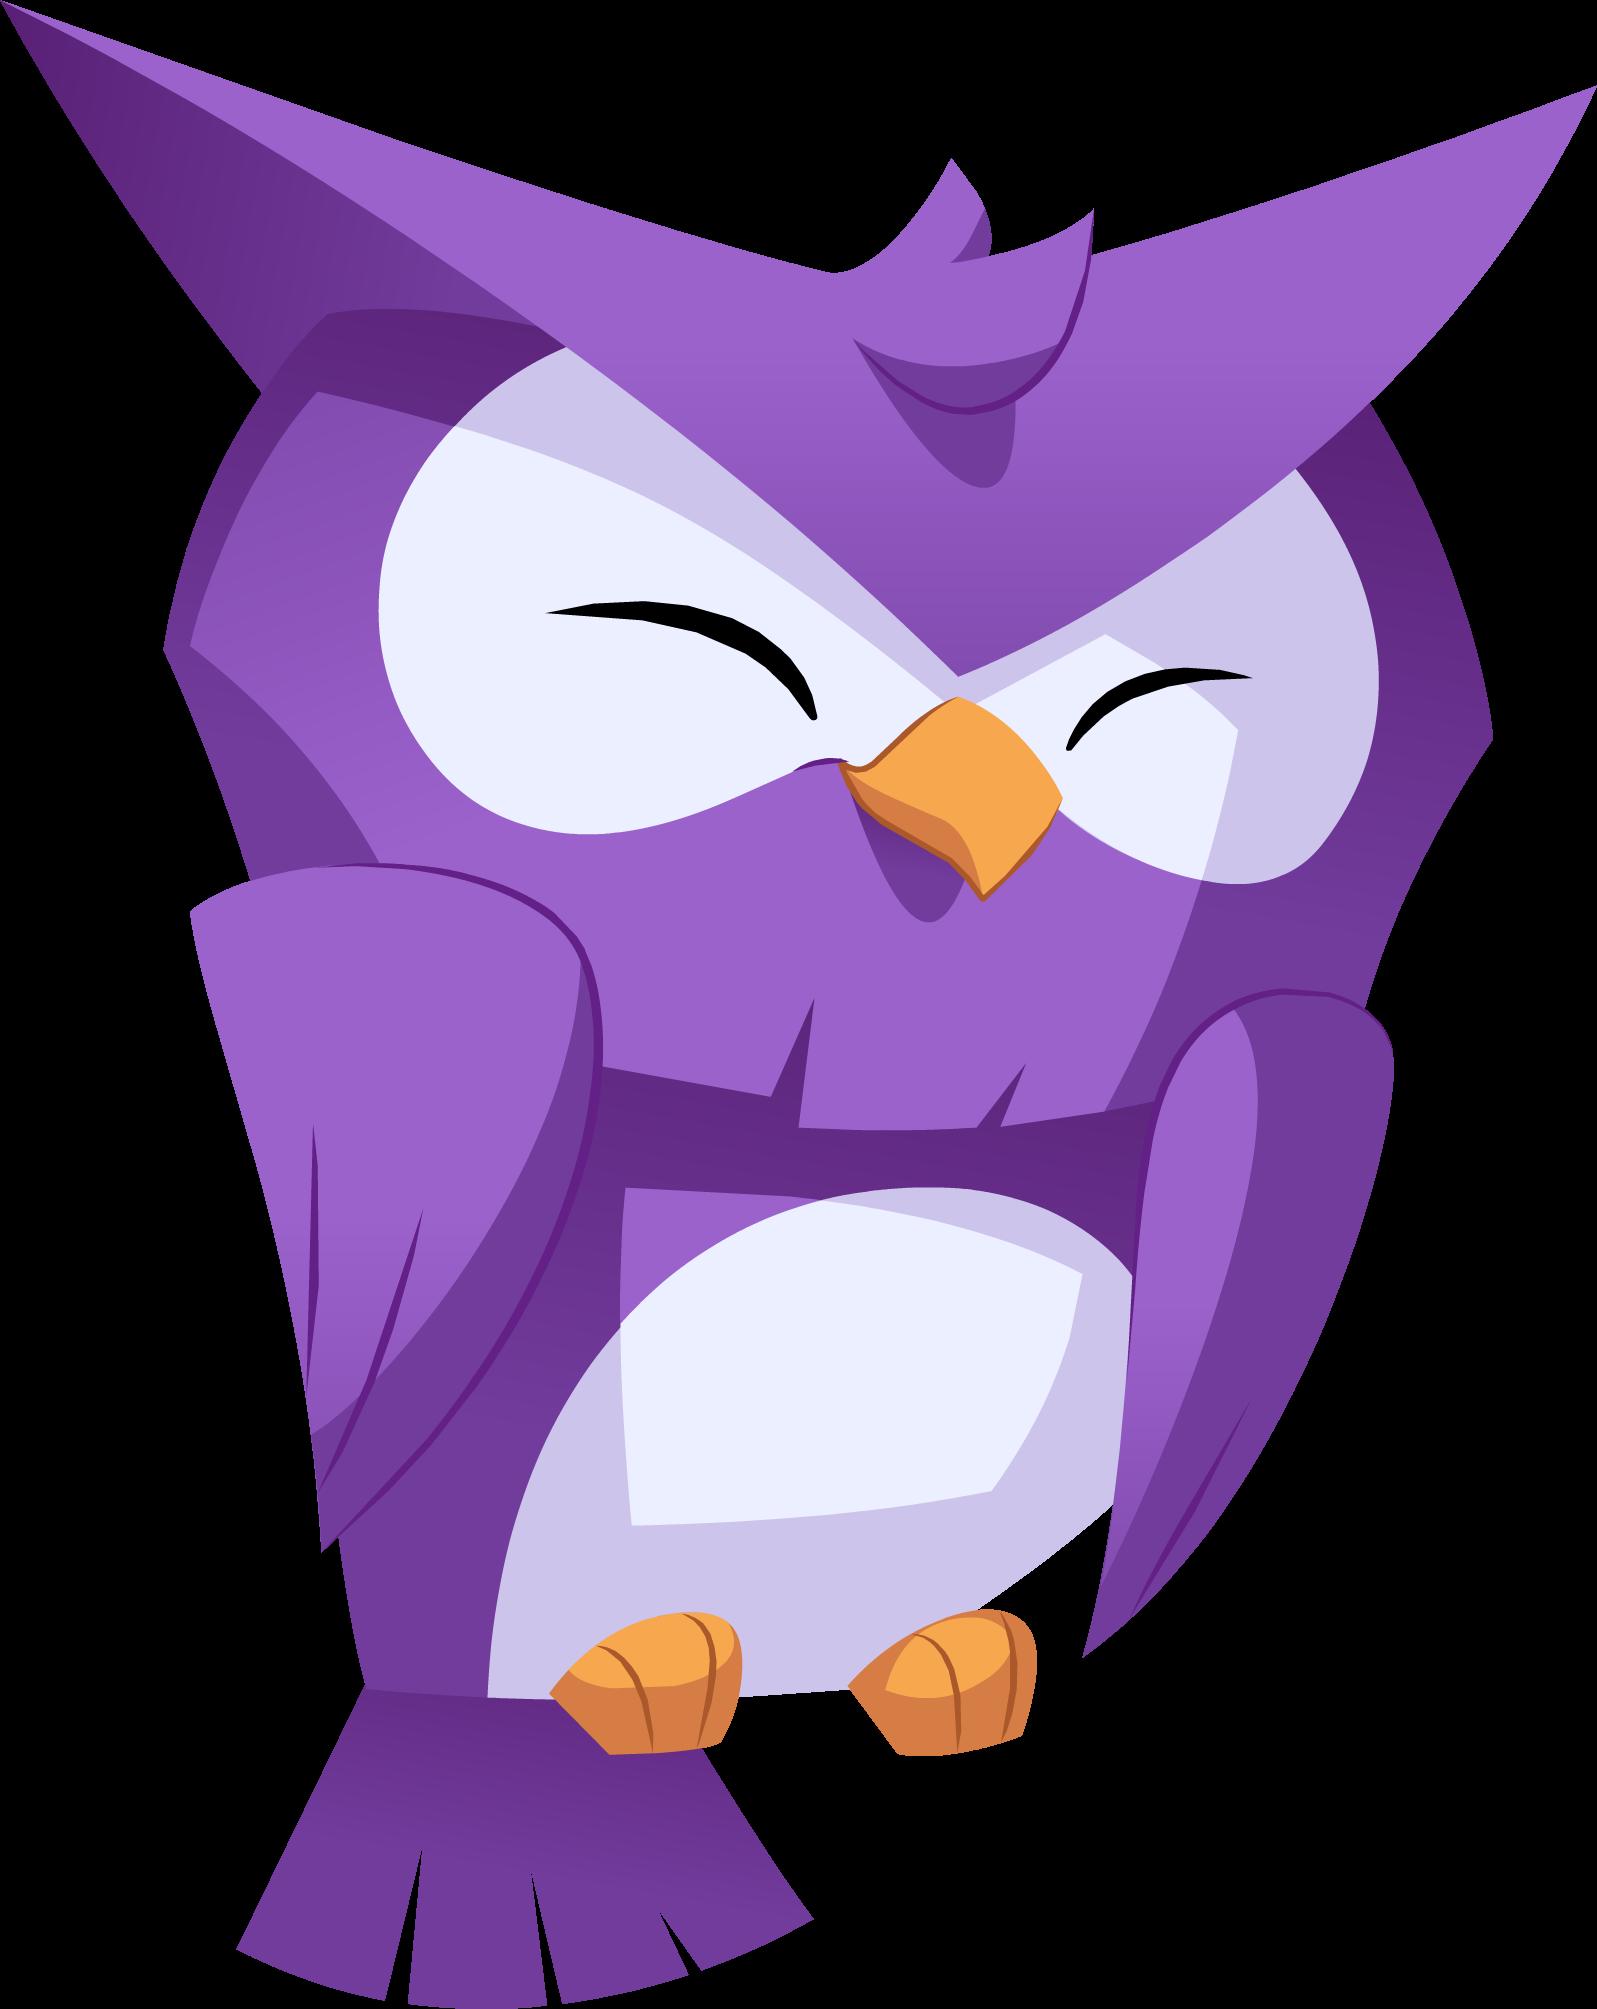 Image owl png animal. Jam clipart purple